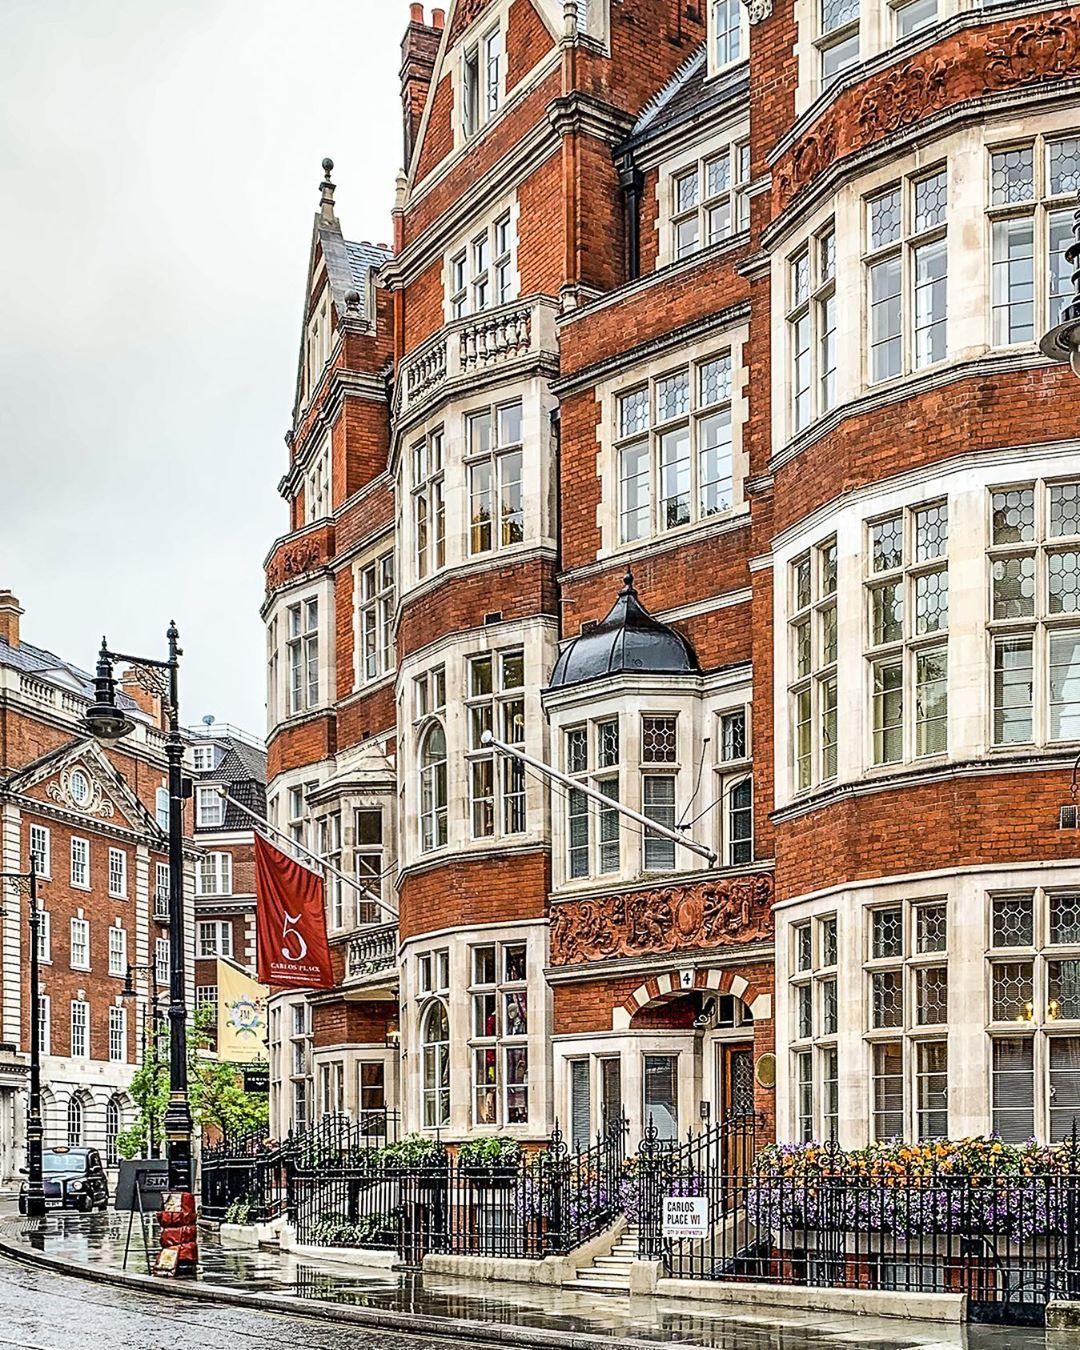 f376034fb86241e269430eb527eda968 - London House Hotel Kensington 81 Kensington Gardens Square